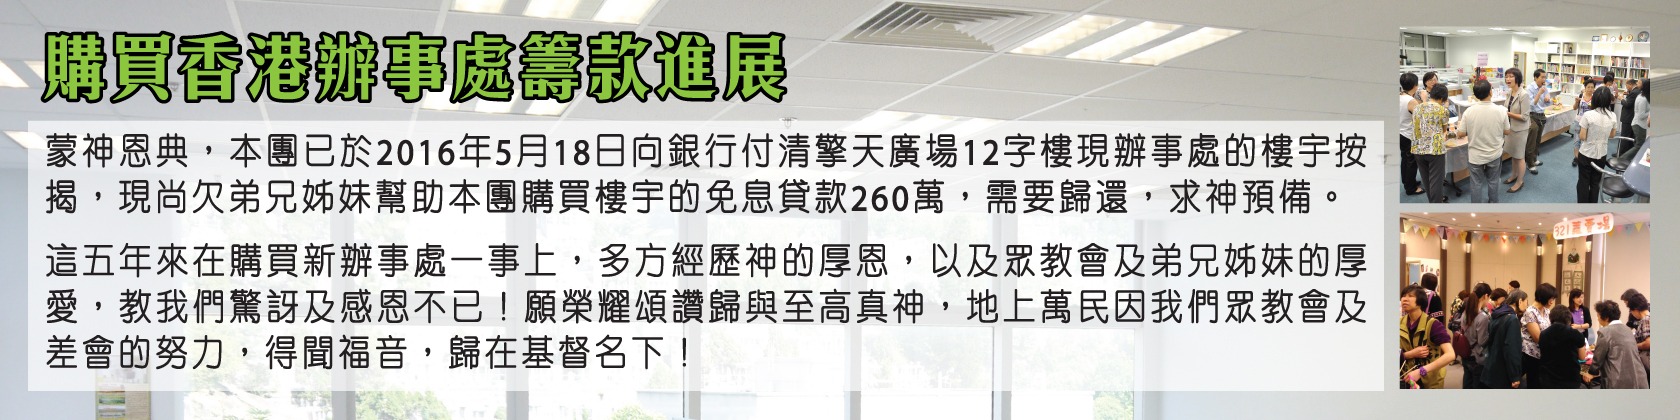 CB-02-web-banner-1680-x-420-032